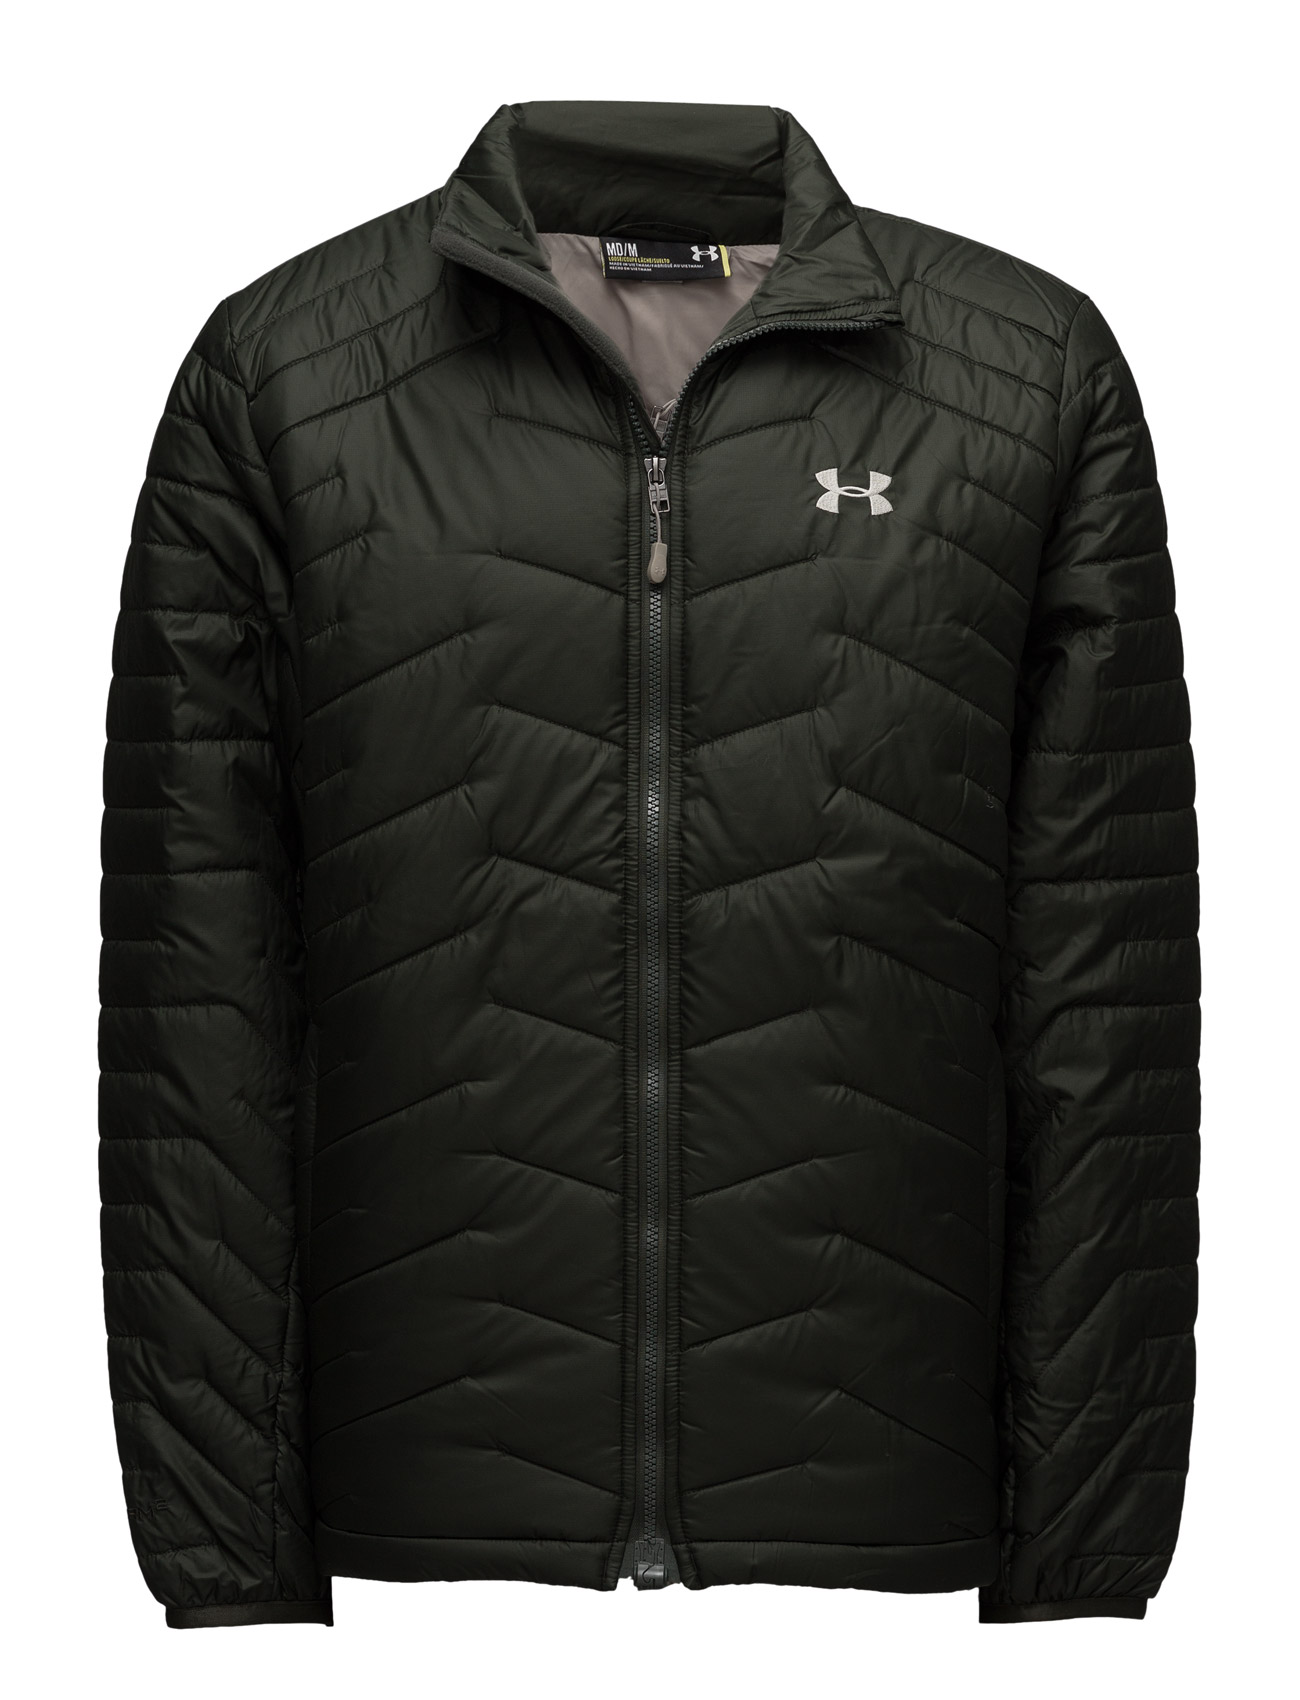 Ua Cgr Jacket Under Armour Jackets